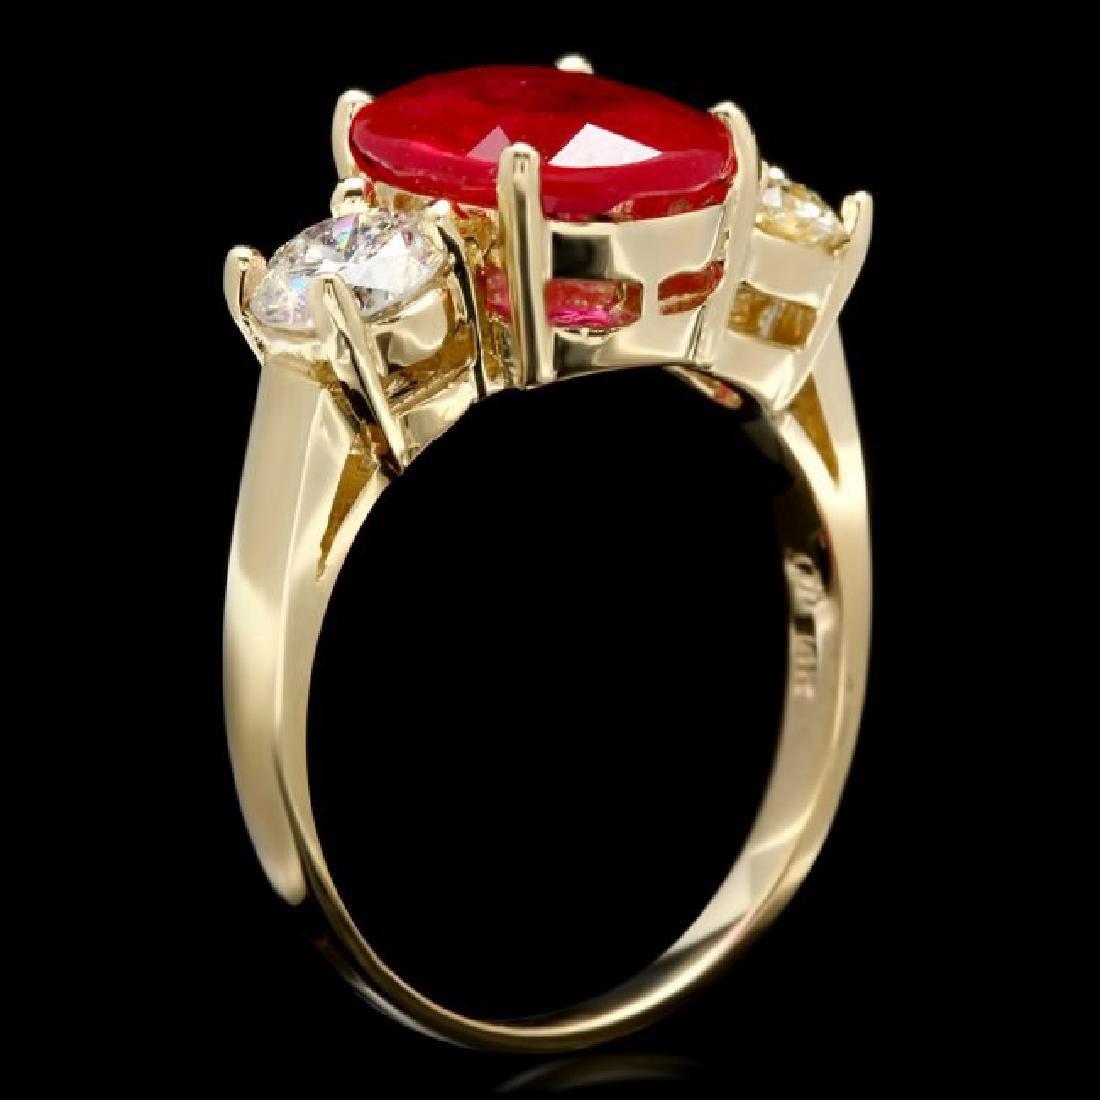 14k Yellow Gold 3.00ct Ruby 1.15ct Diamond Ring - 3